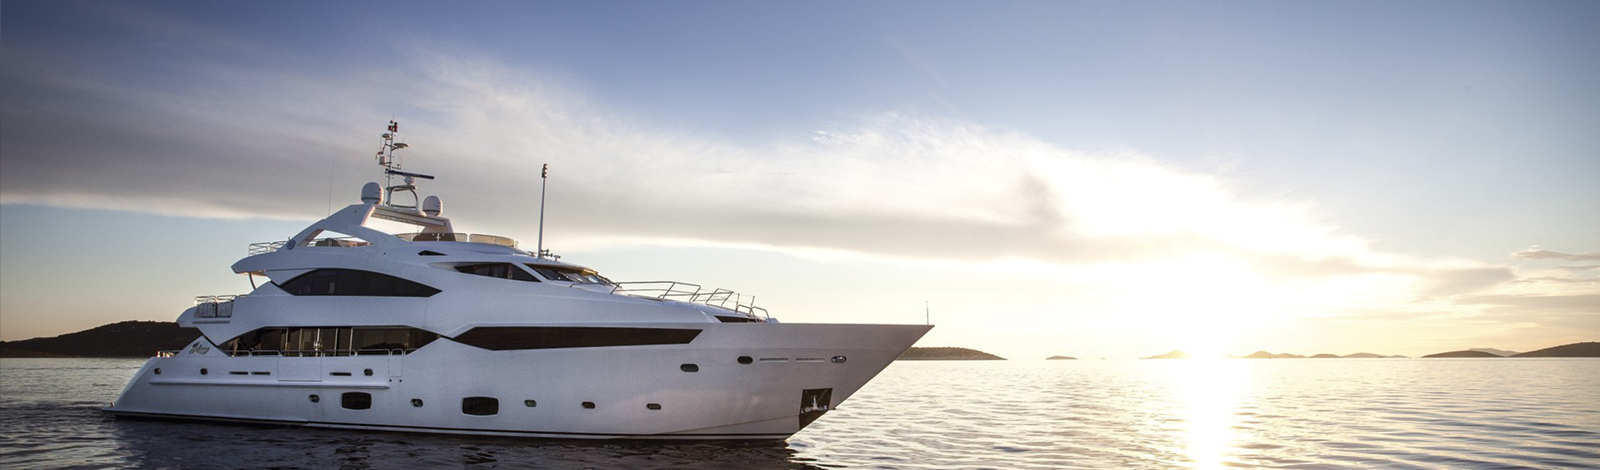 Yacht-viaggio-nozze-twr